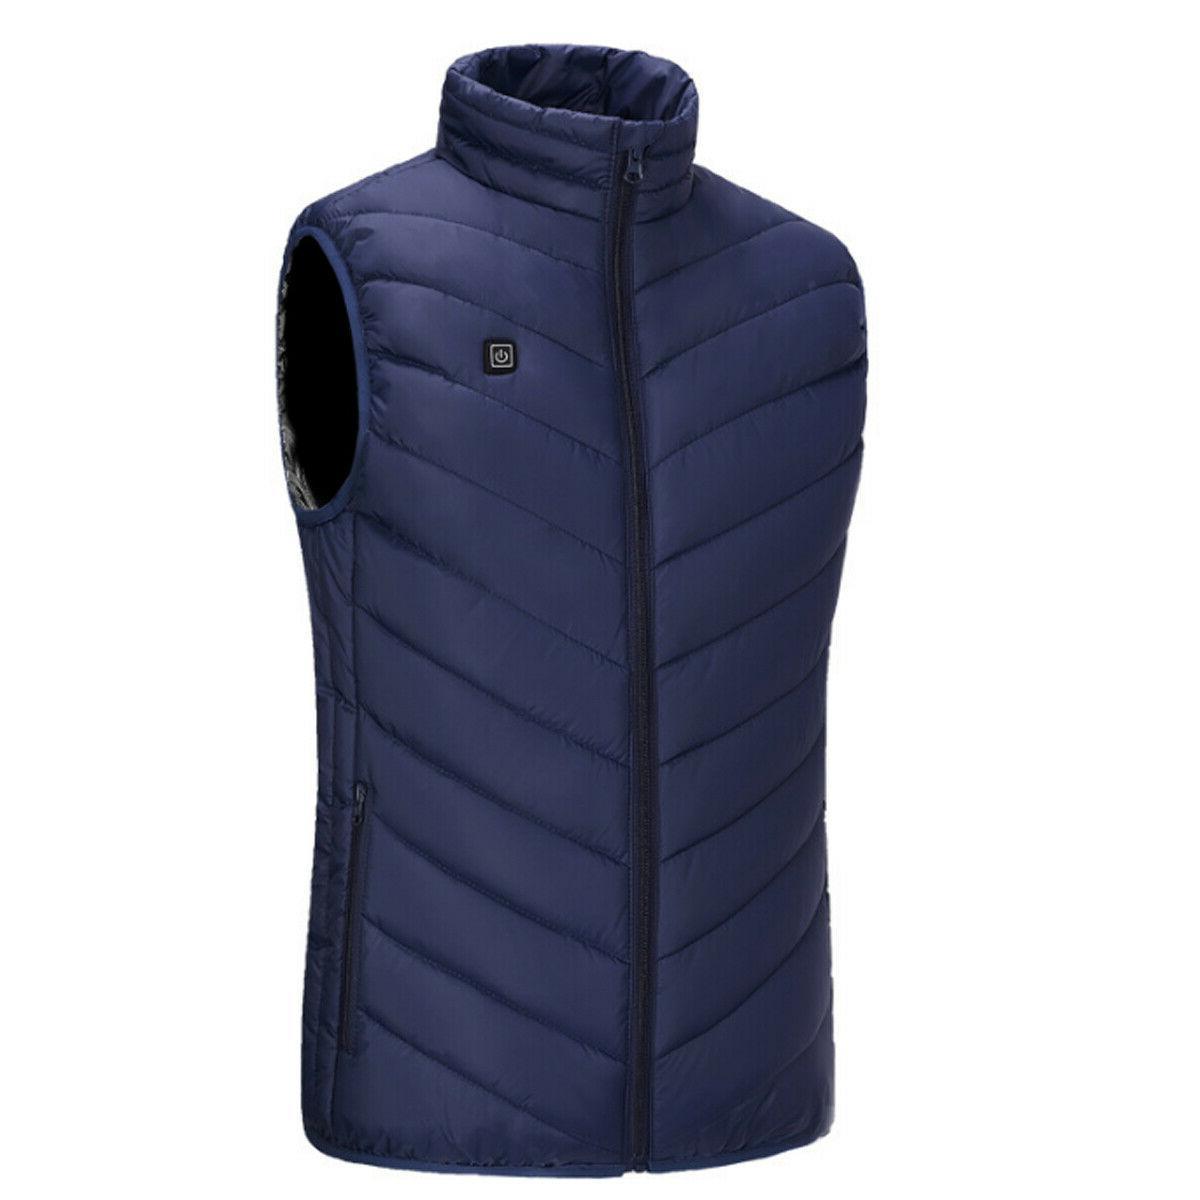 Electric Jacket Warm Heating Pad Warmer Men